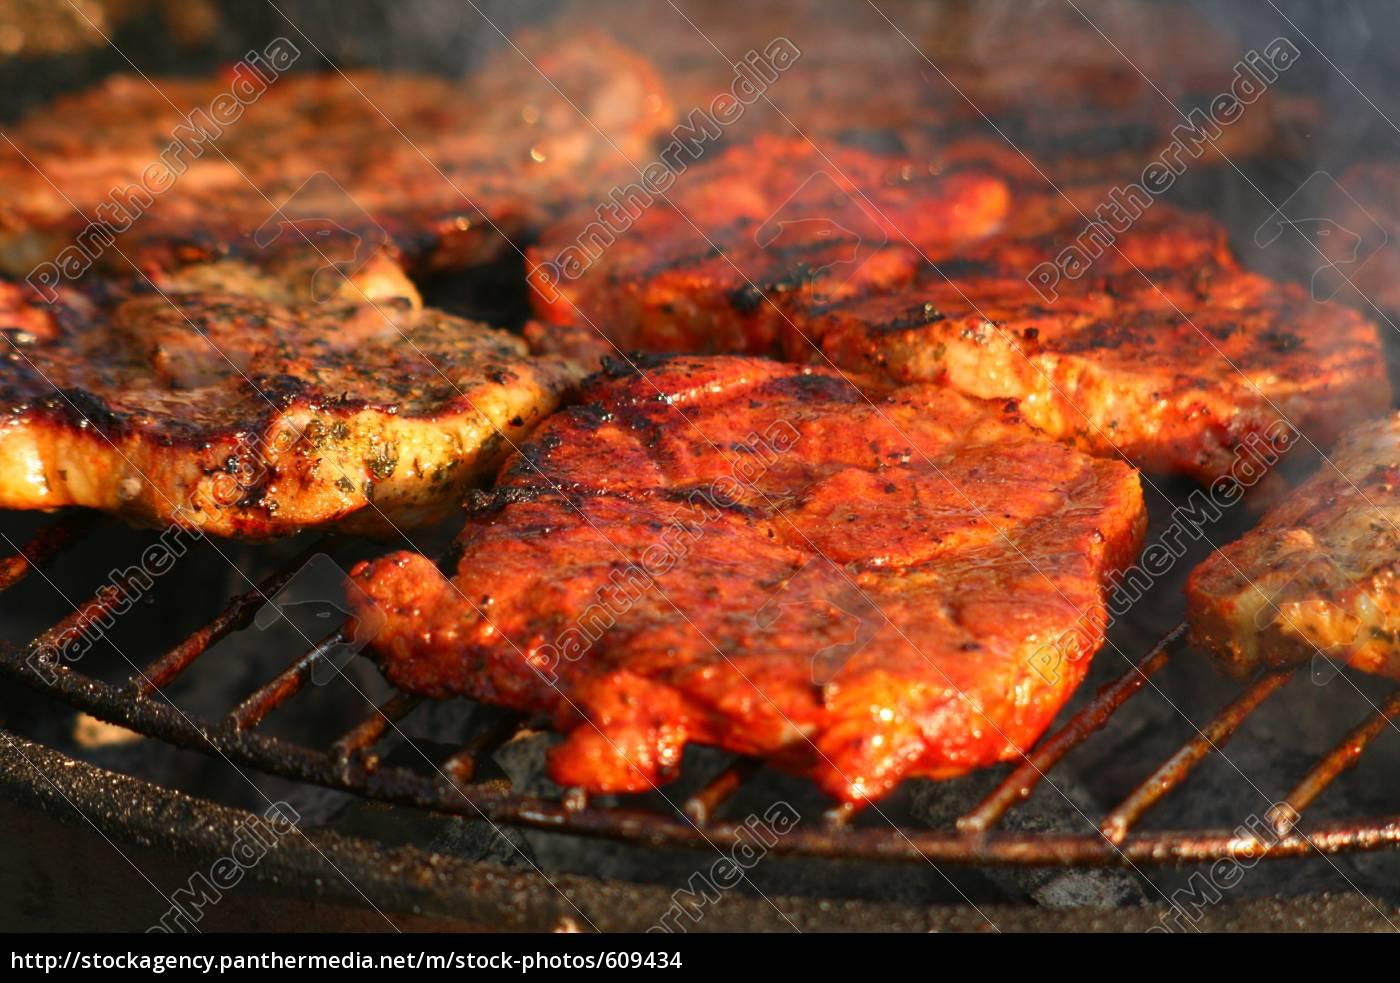 eingeleutet, barbecue, season - 609434